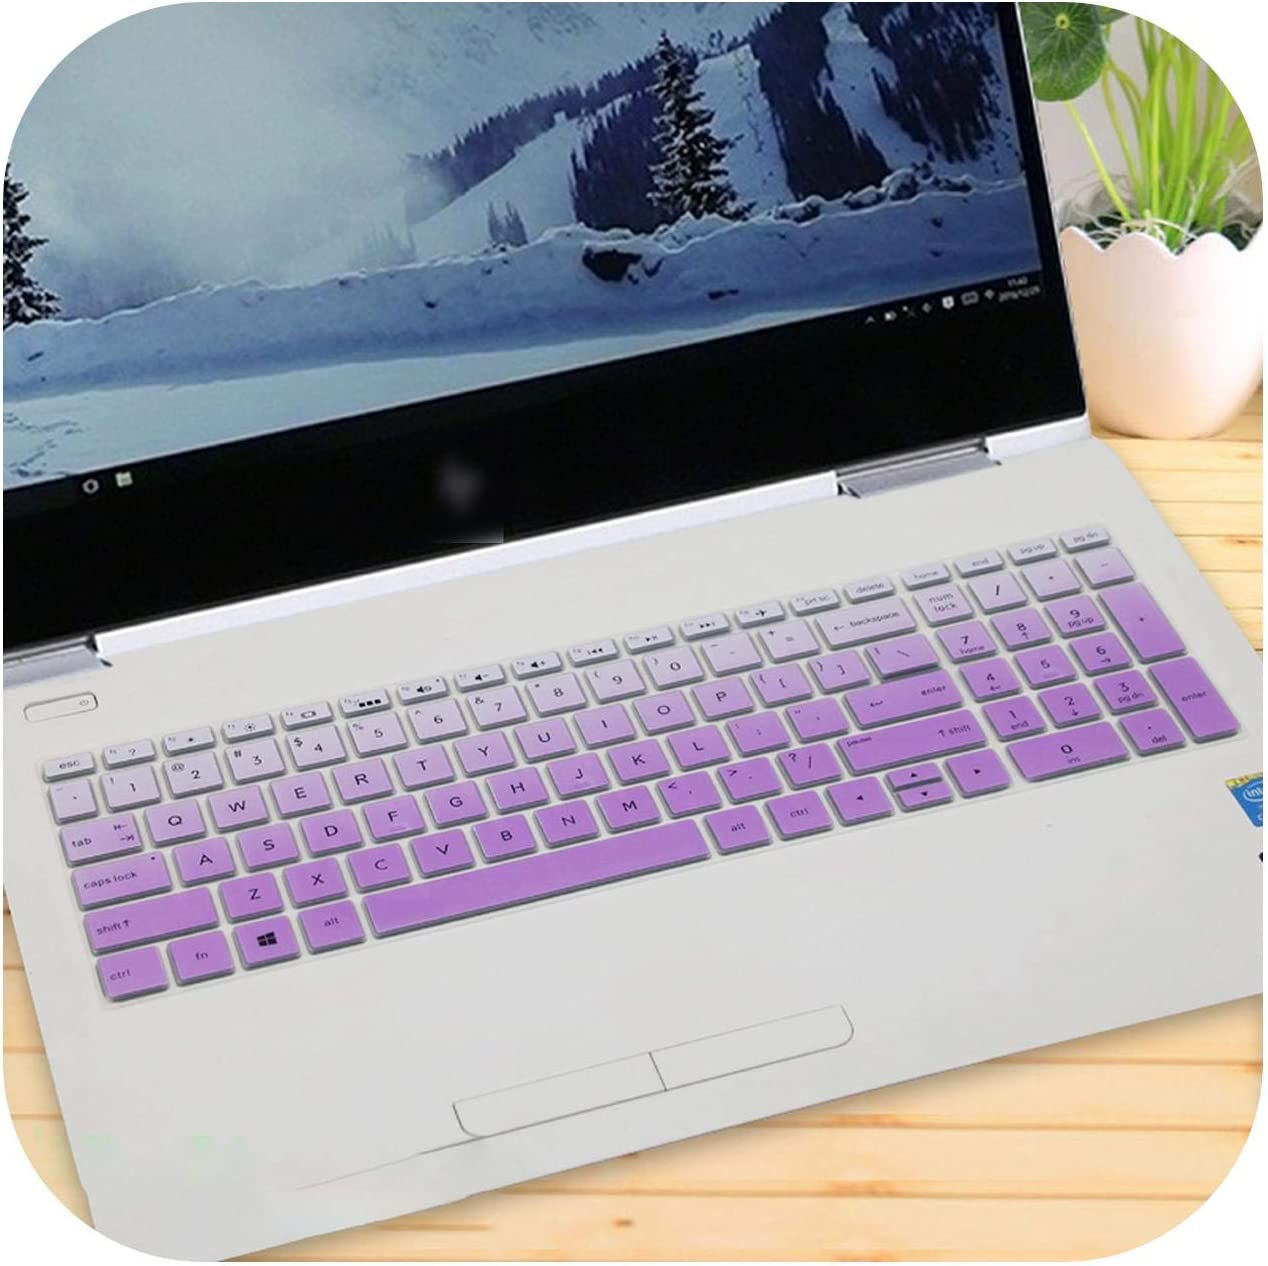 15 15.6 Inch Laptop Keyboard Cover for Hp Envy X360 Bp Bq Ch Cn Cs Series with AMD Ryzen 5 2500U 2700U 15-Bq101Na-Fadepurple-